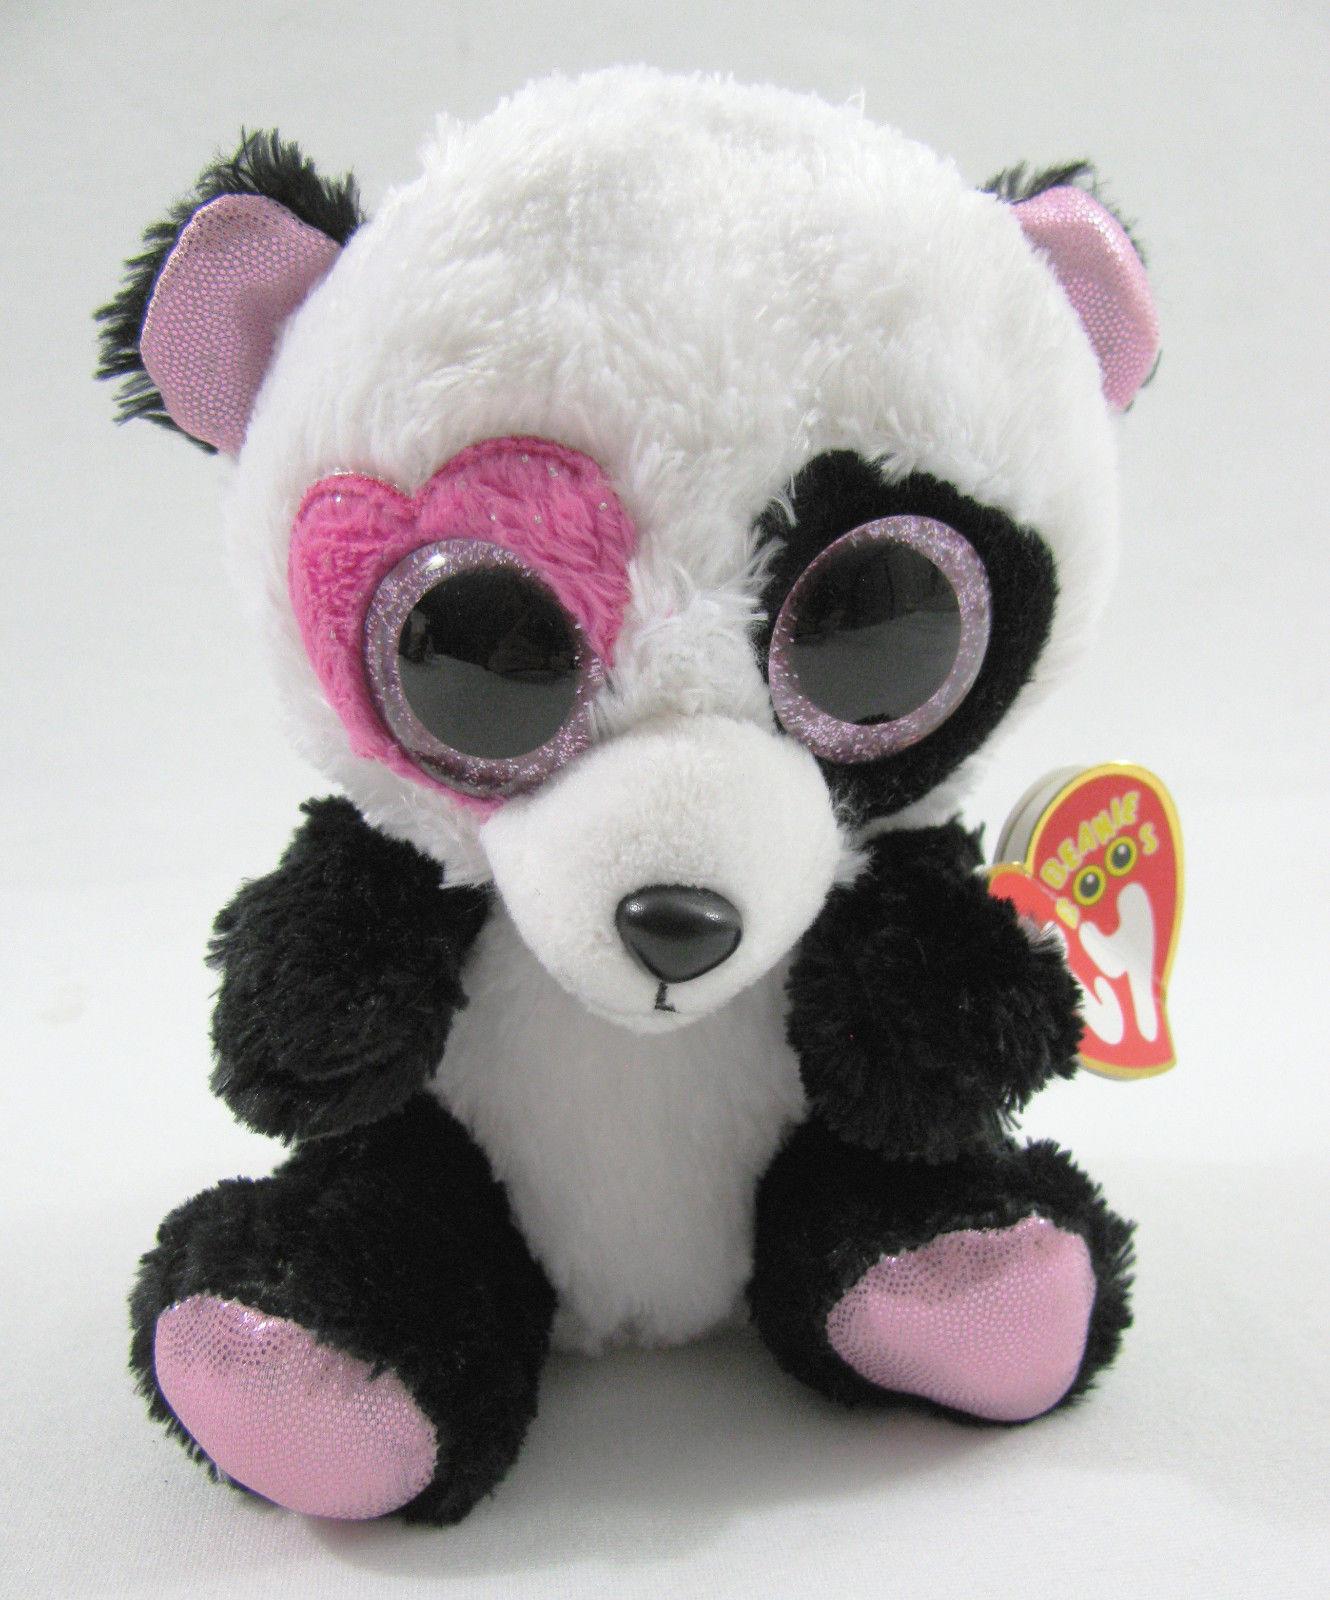 2e5cad38036 57. 57. Previous. TY Beanie Boos MANDY Valentine Panda Bear 6